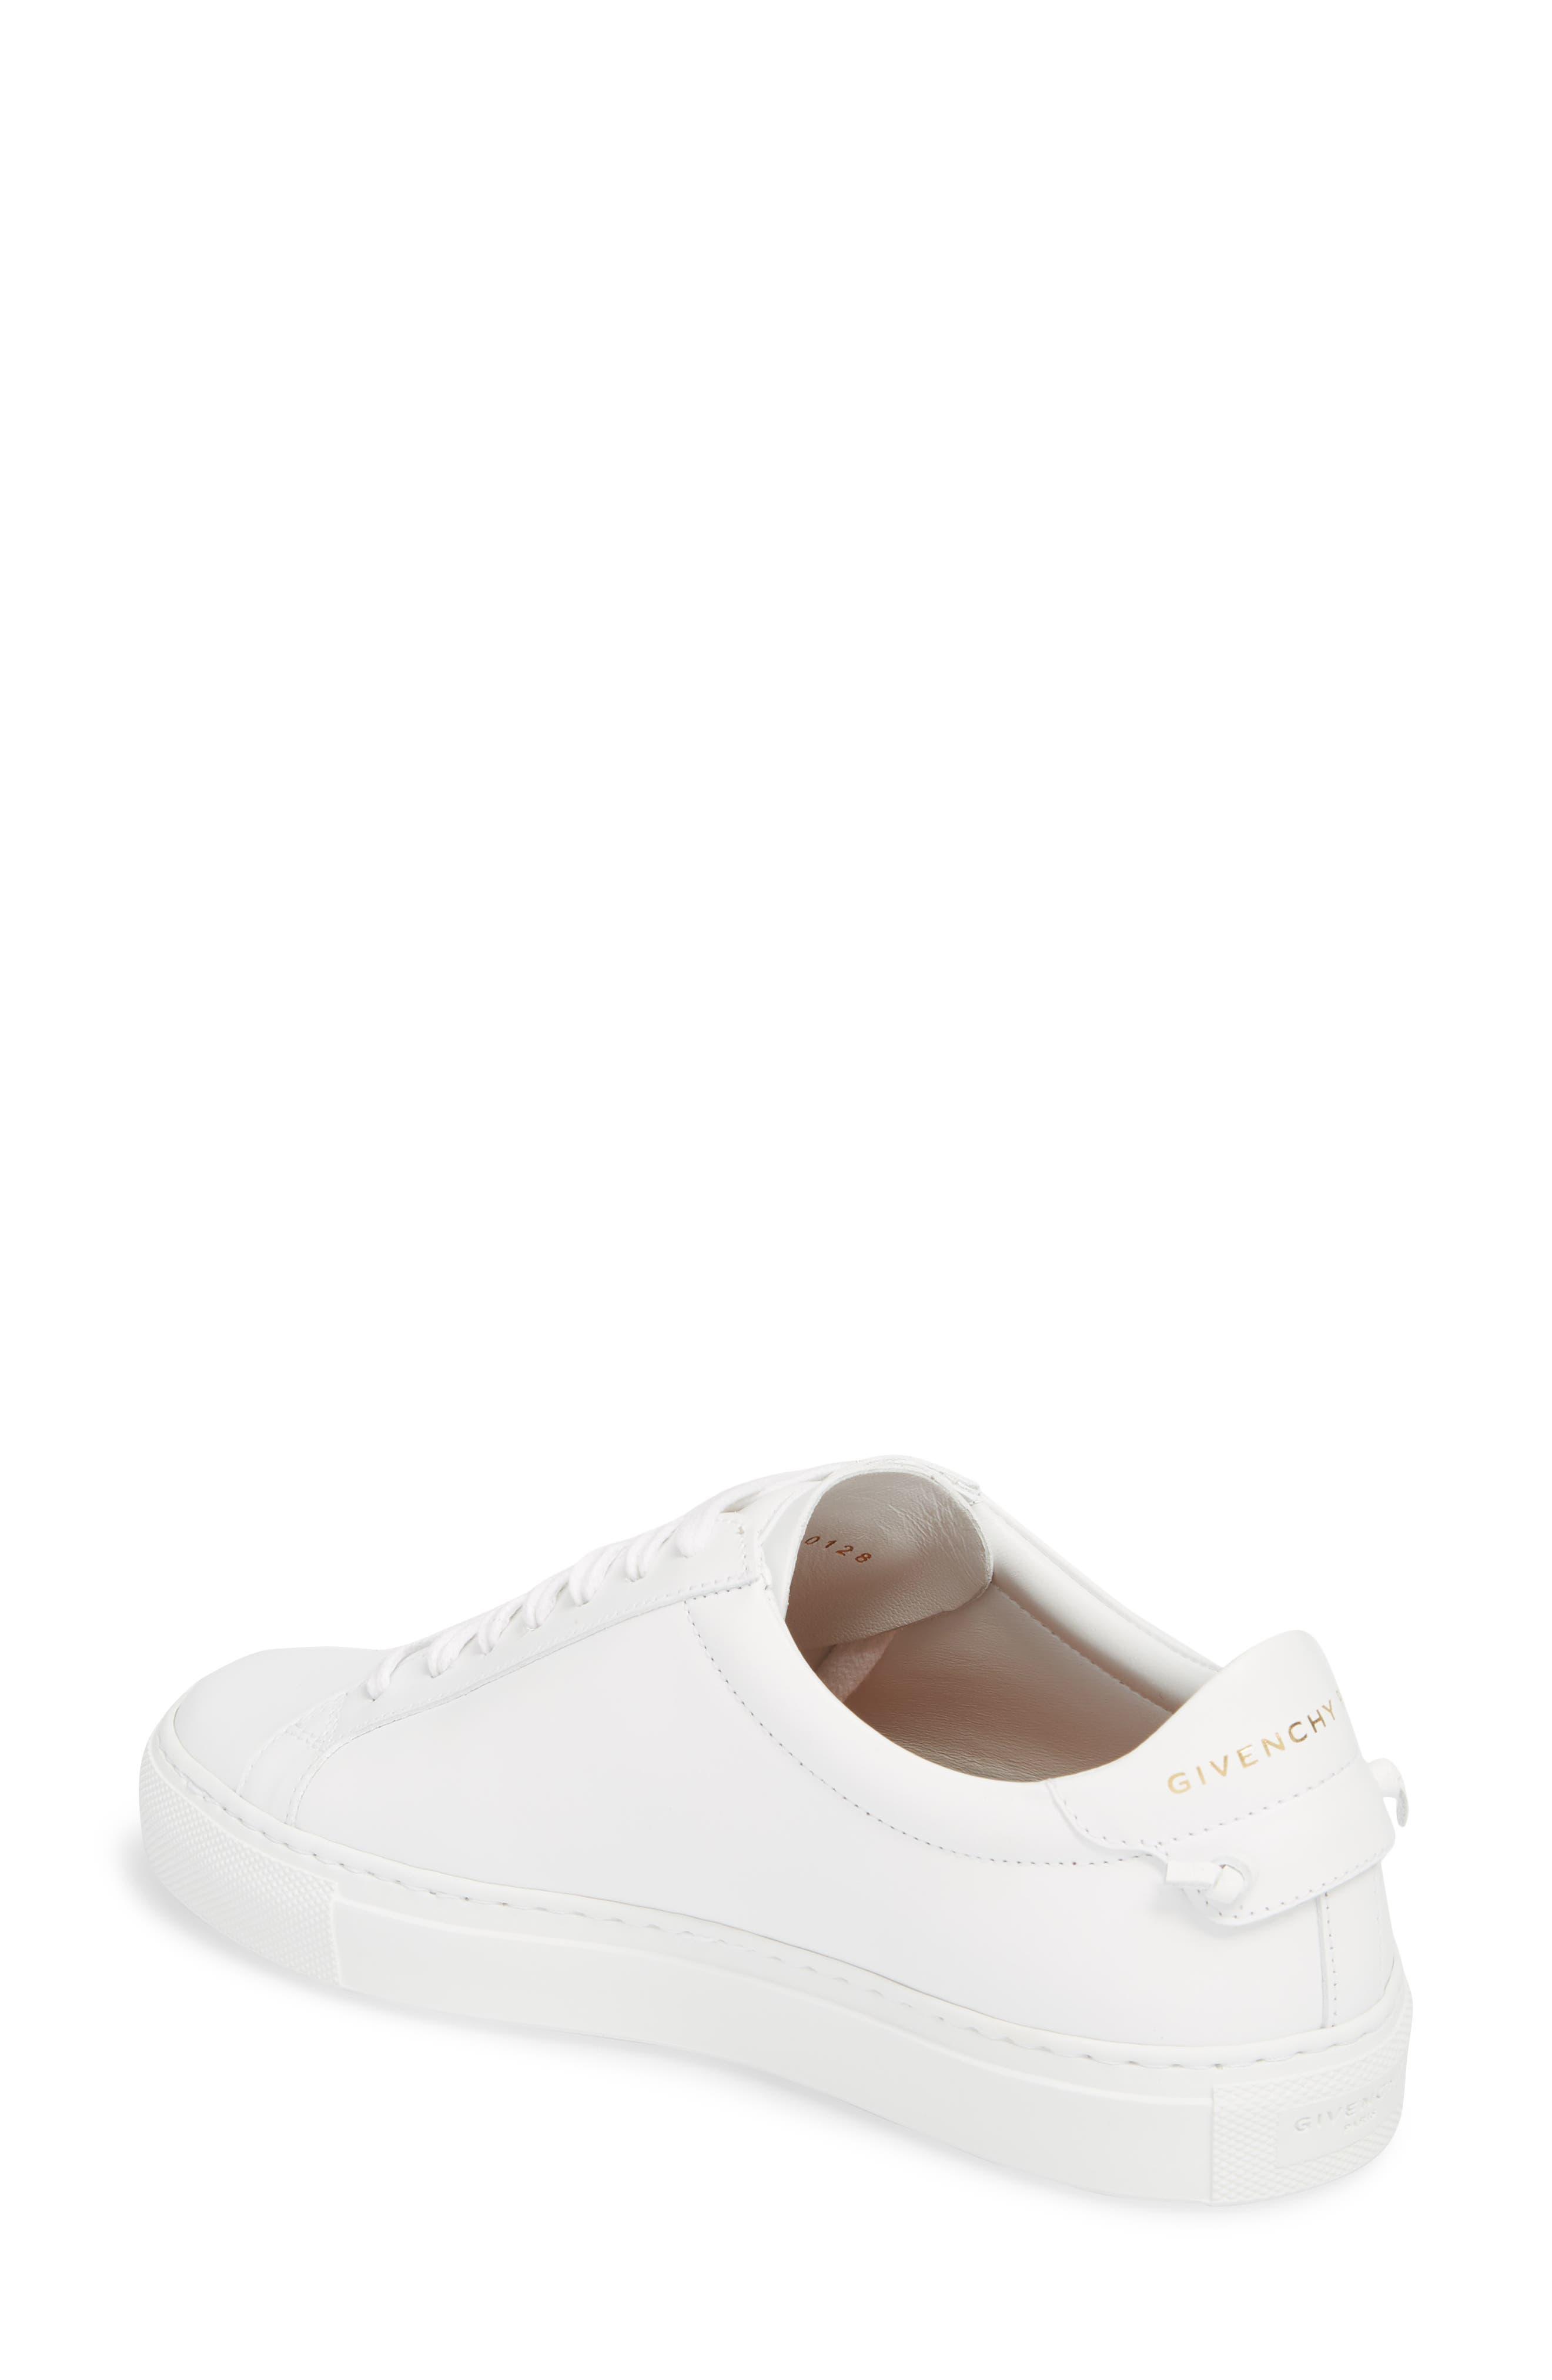 Low Top Sneaker,                             Alternate thumbnail 2, color,                             OPTIC WHITE